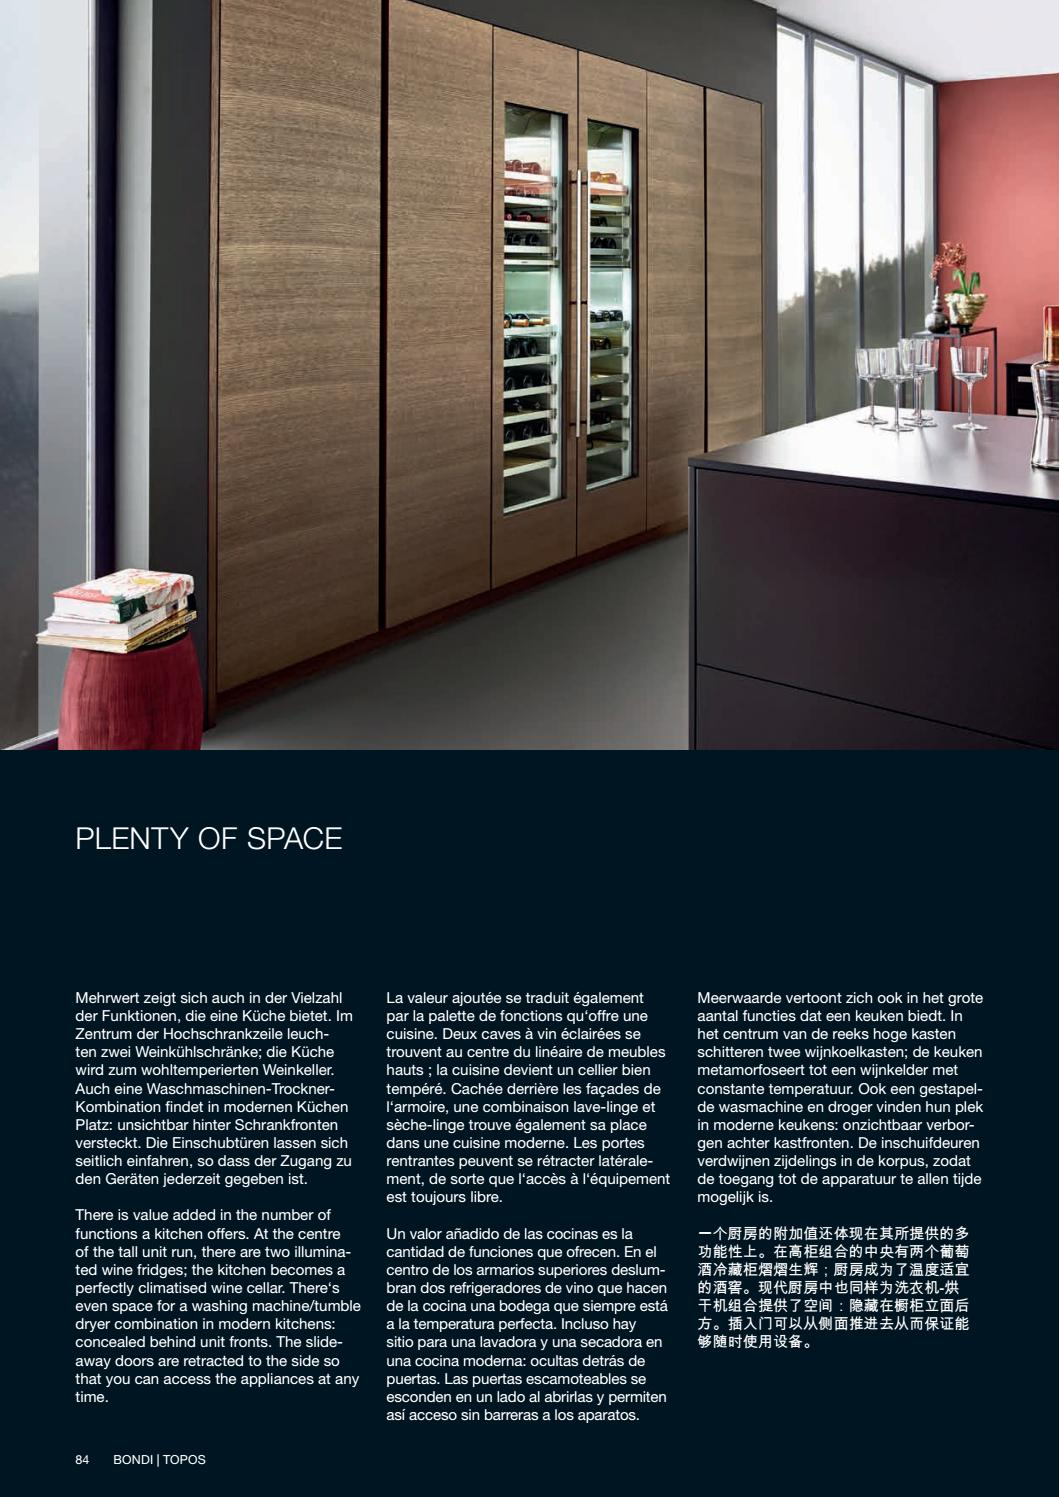 Cave À Vin Palette divine design center - leicht - modern kitchens 17 - catalog